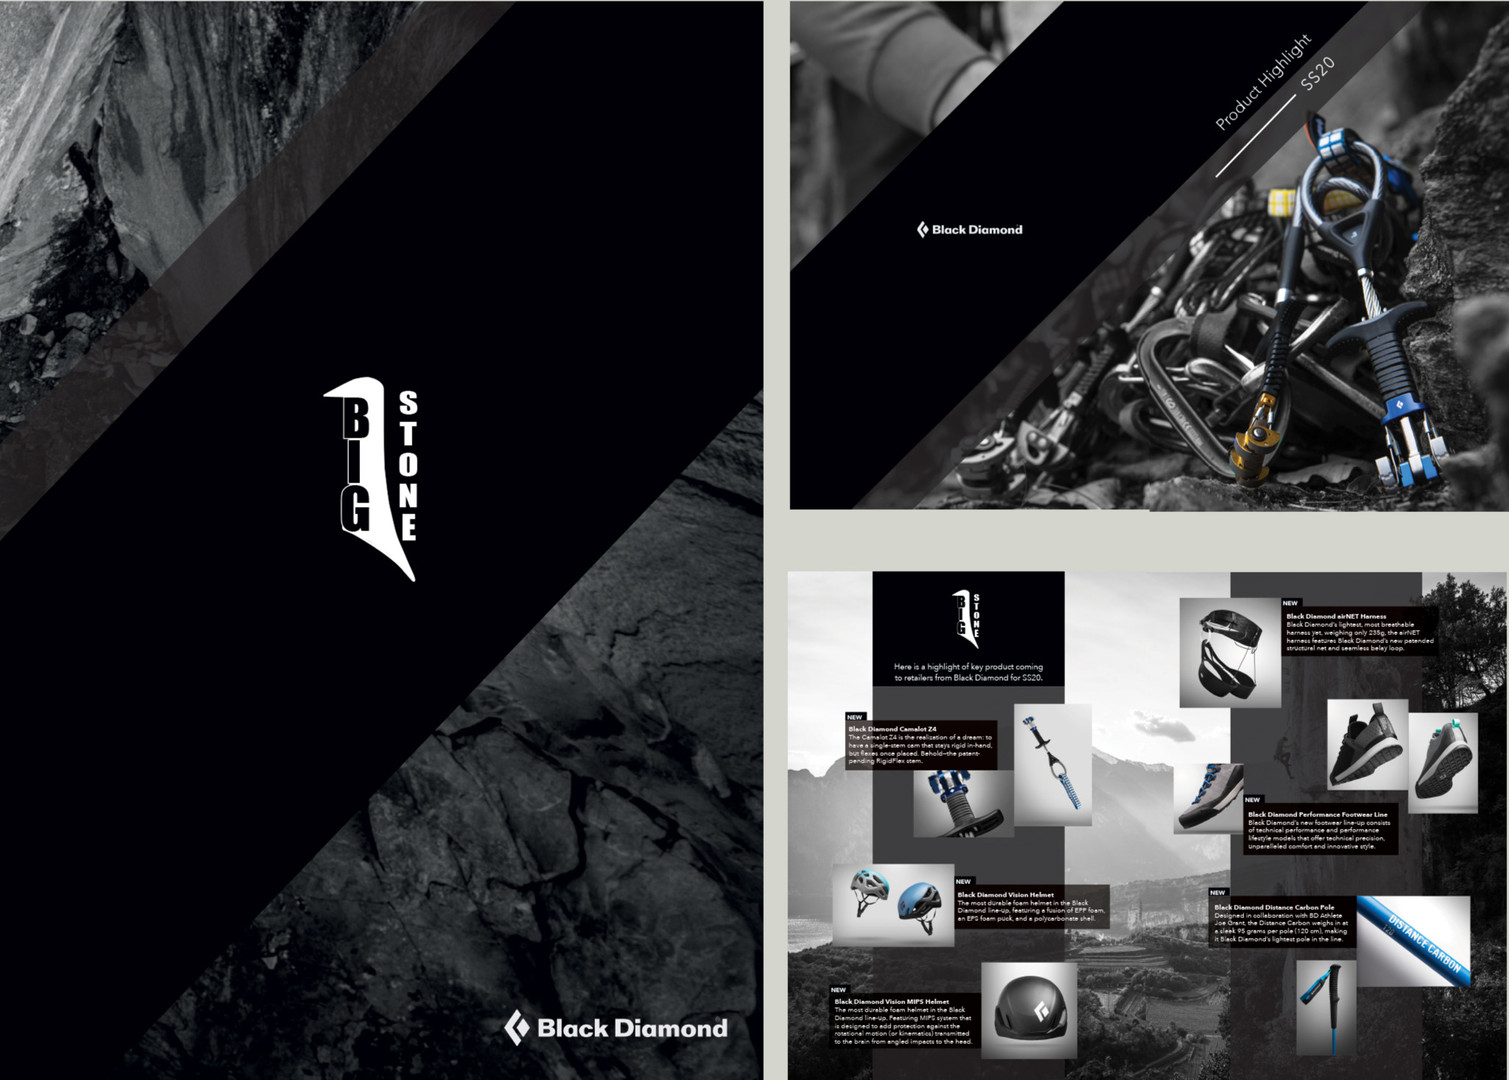 Bigstone Brochure and Website Design